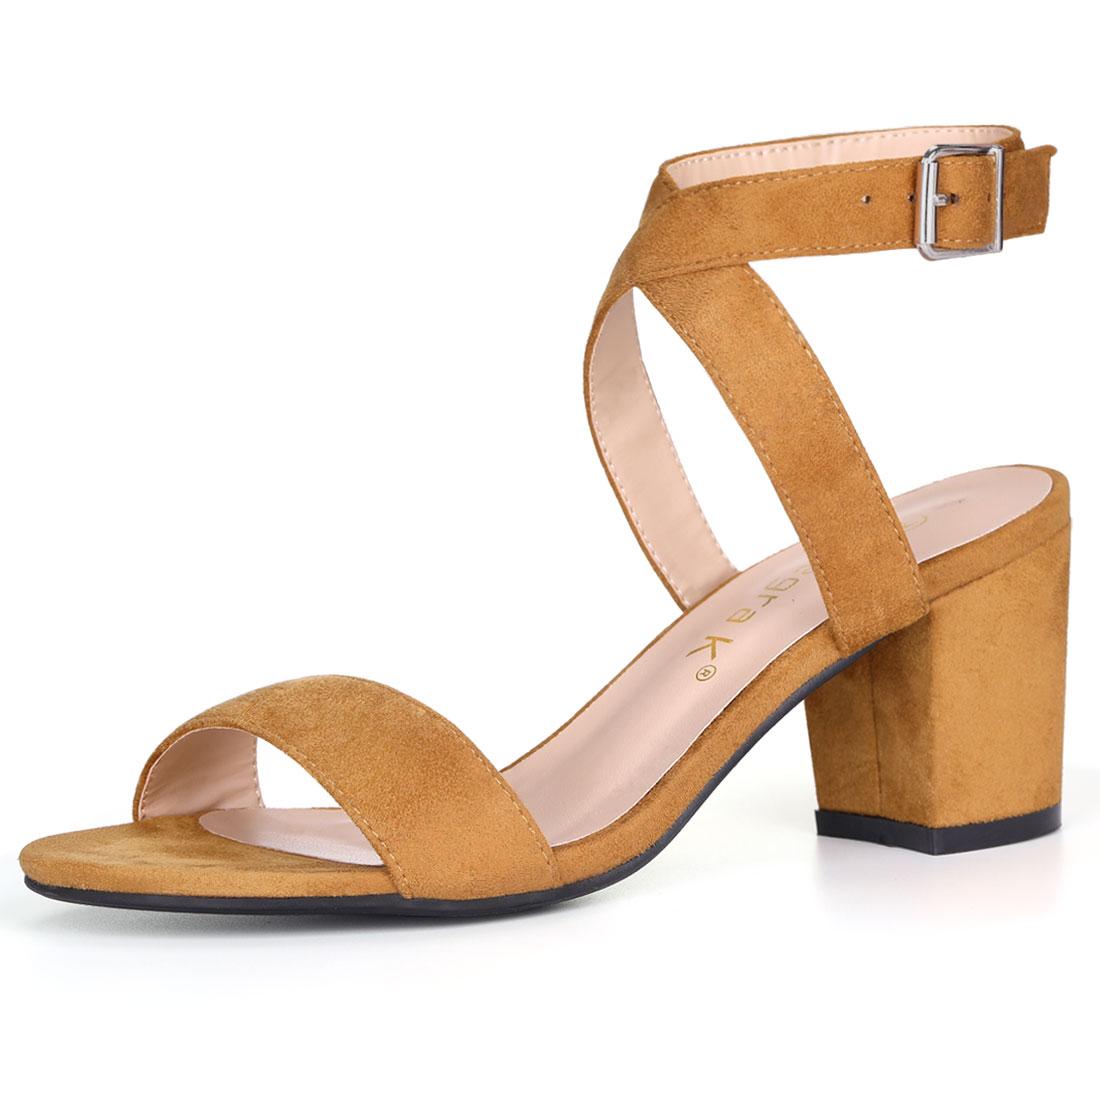 Allegra K Women's Crisscross Mid Block Heel Ankle Strap Sandals Brown US 6